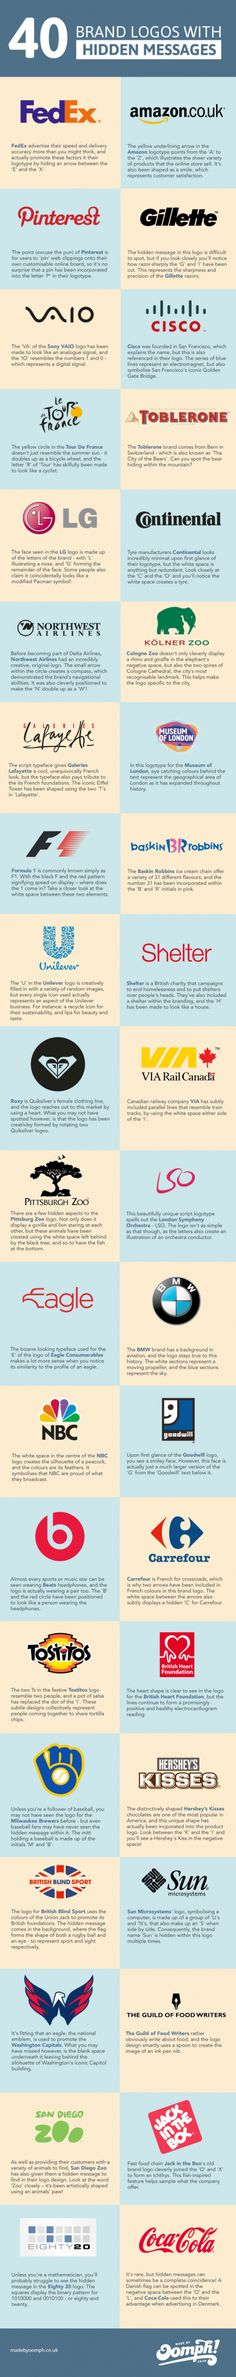 40 Logos With Hidden Messages #branding